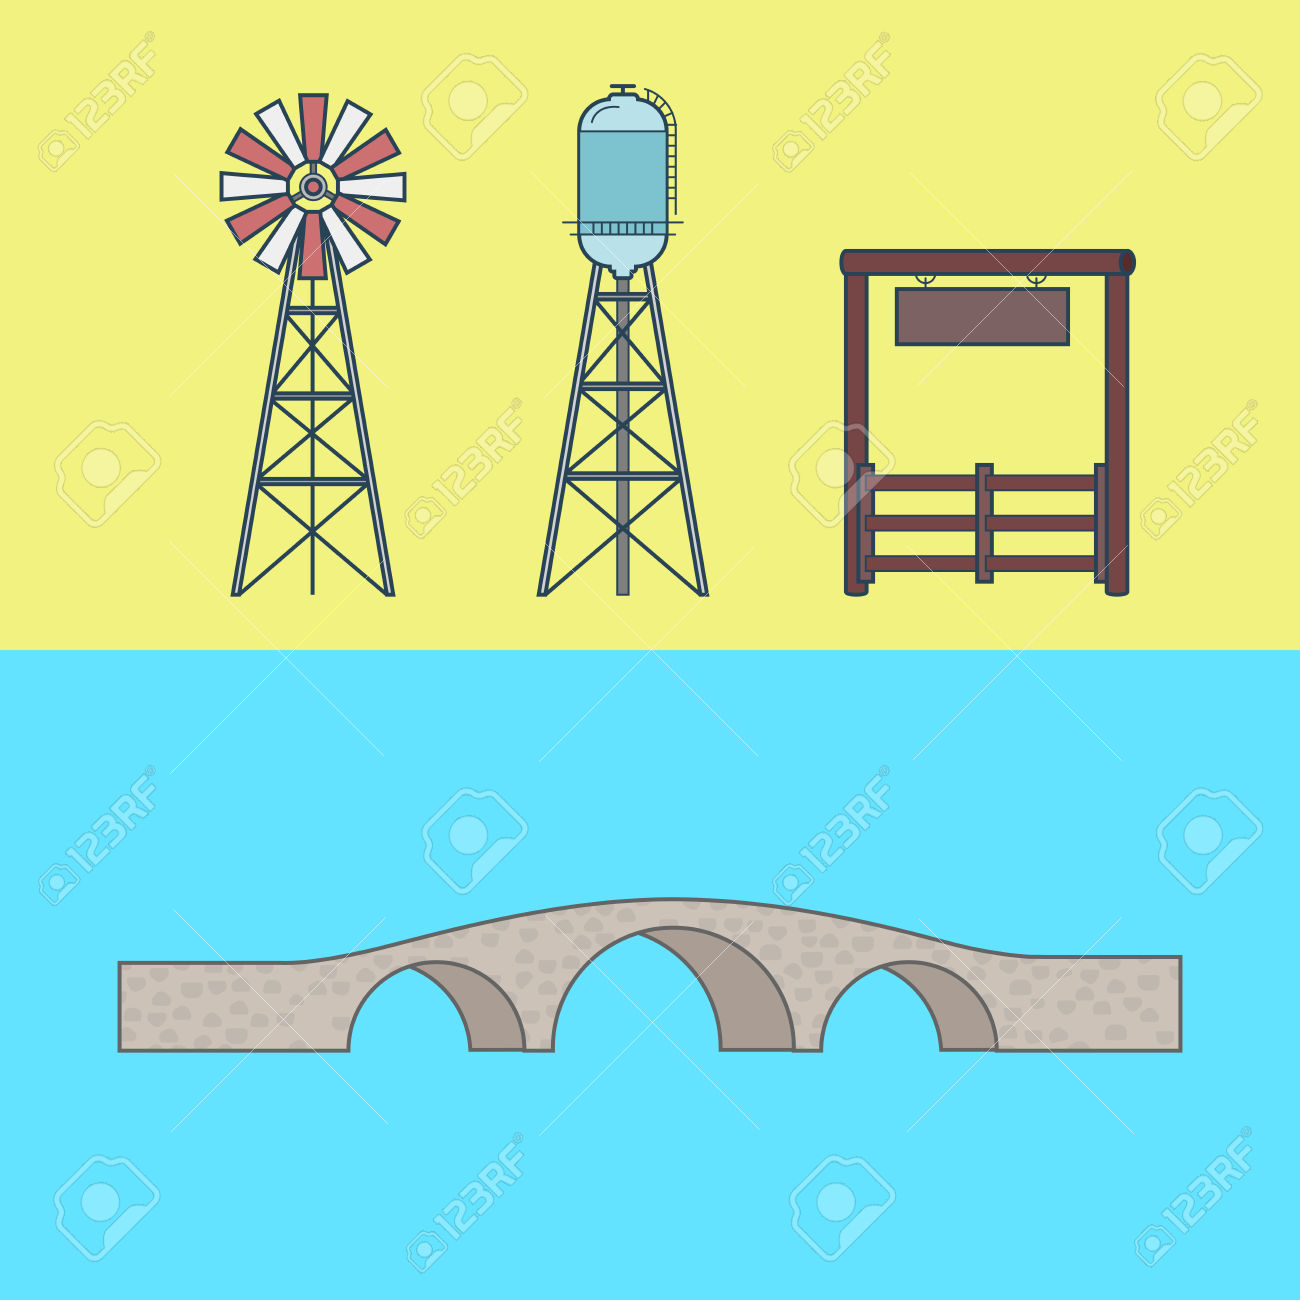 Goga rancho clipart #3